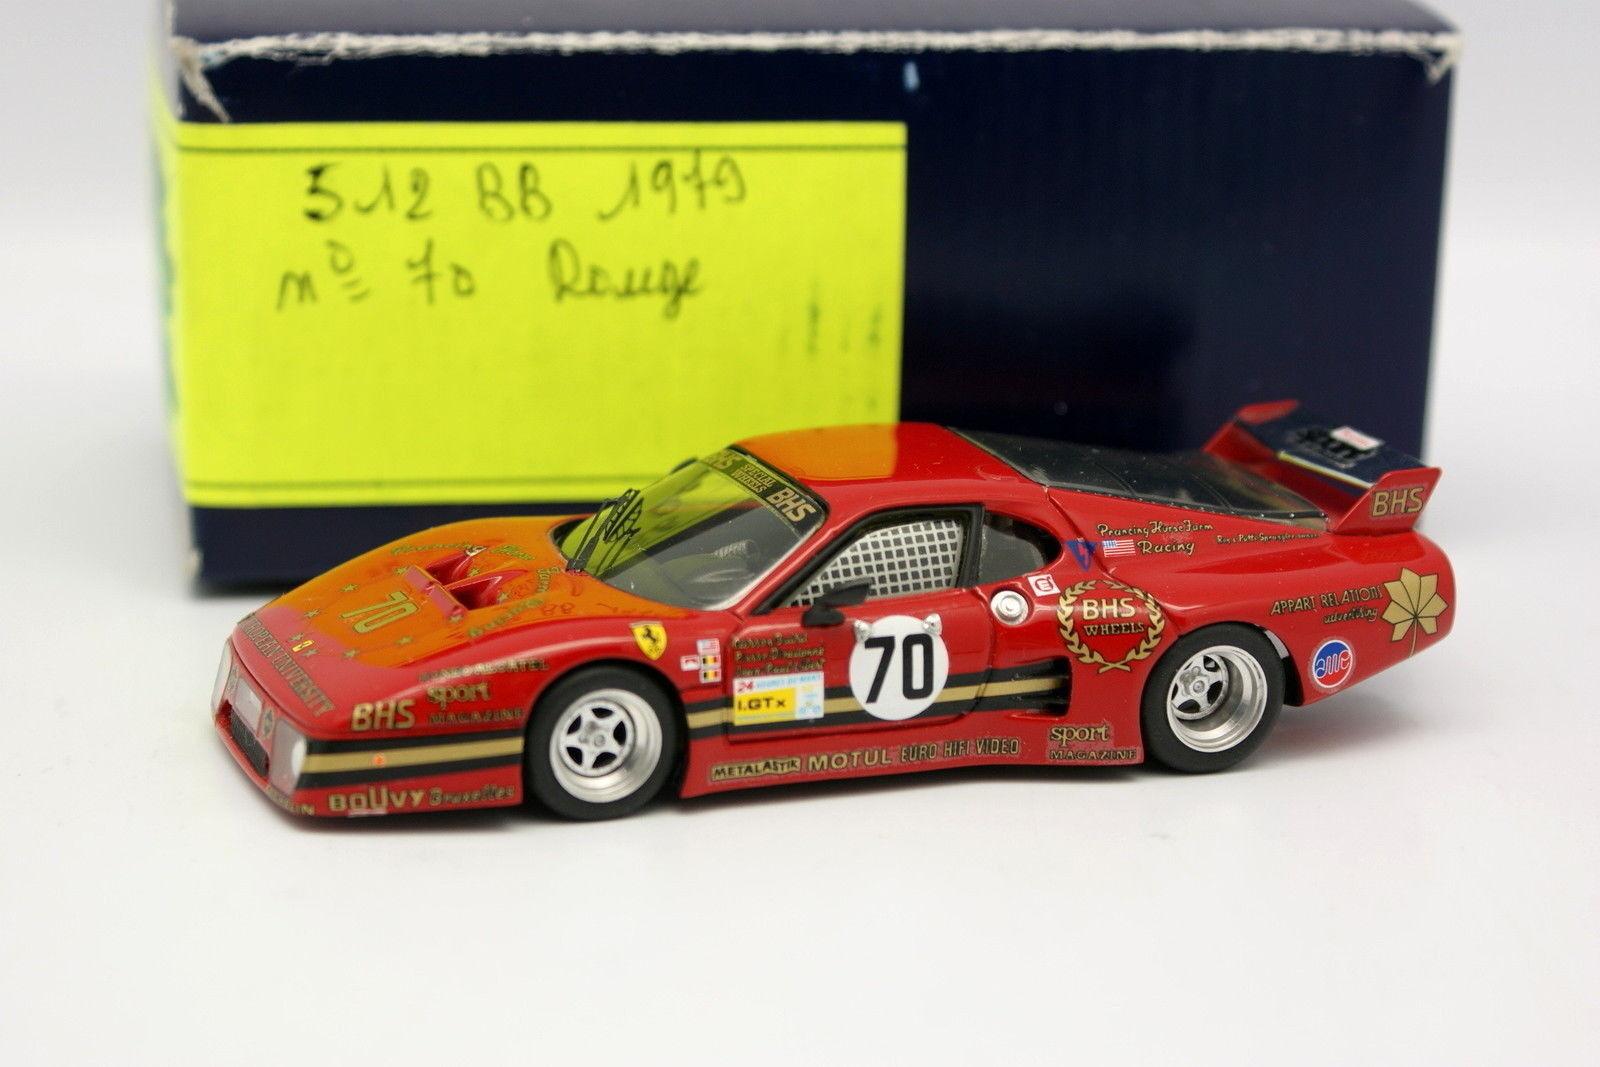 AMR Kit Montado 1 43 - Ferrari 512 BB BHS Le Mans 1979 Nº70